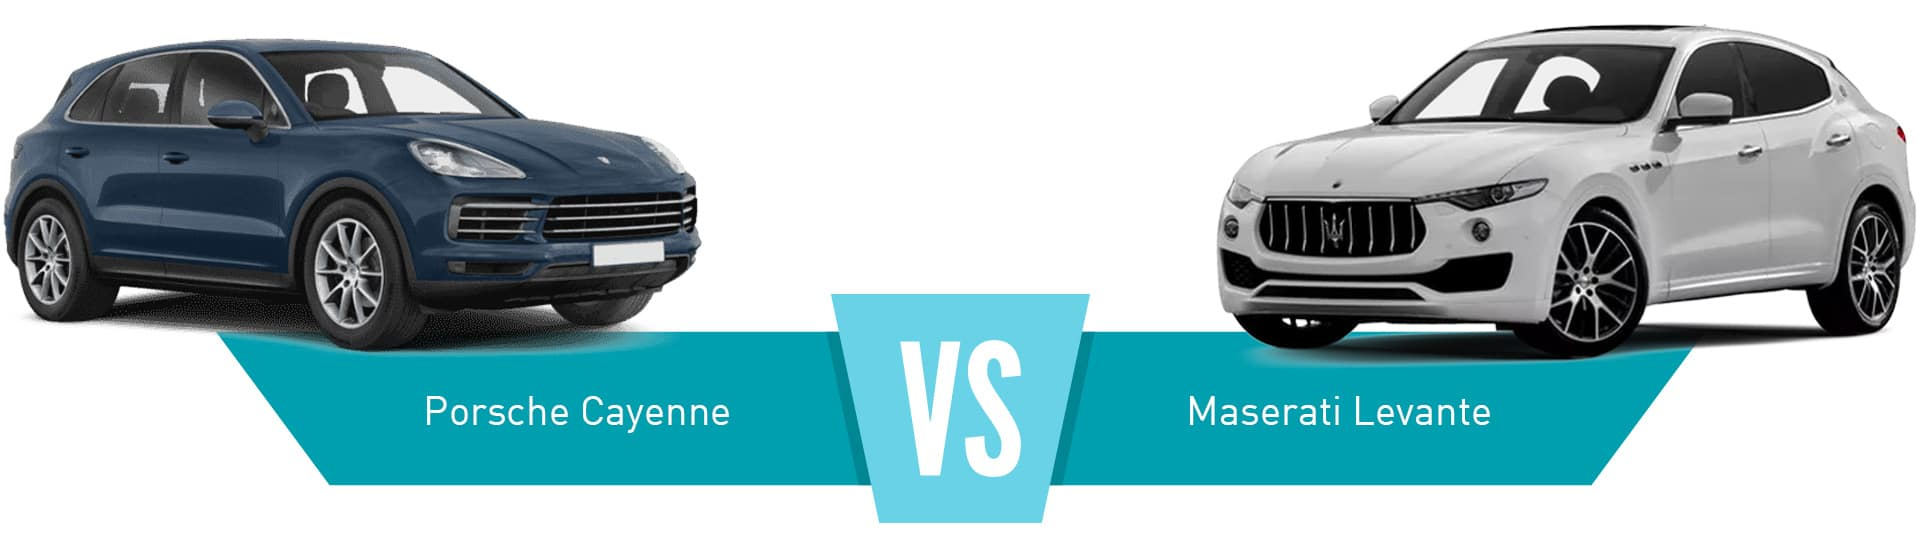 Maserati Levante Versus Porsche Cayenne | Maserati of Cincinnati